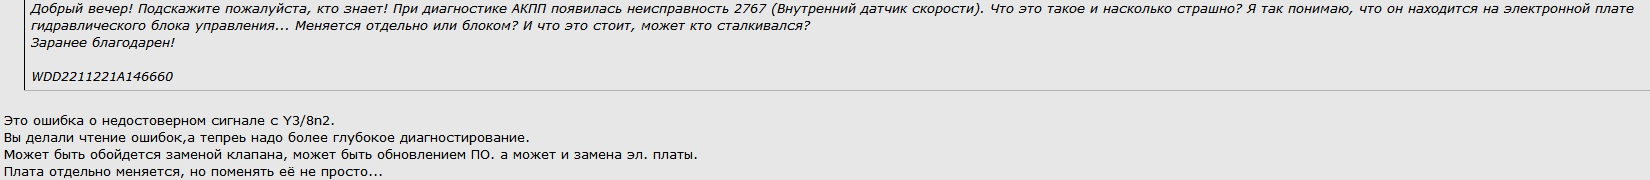 Отзыв 722.9